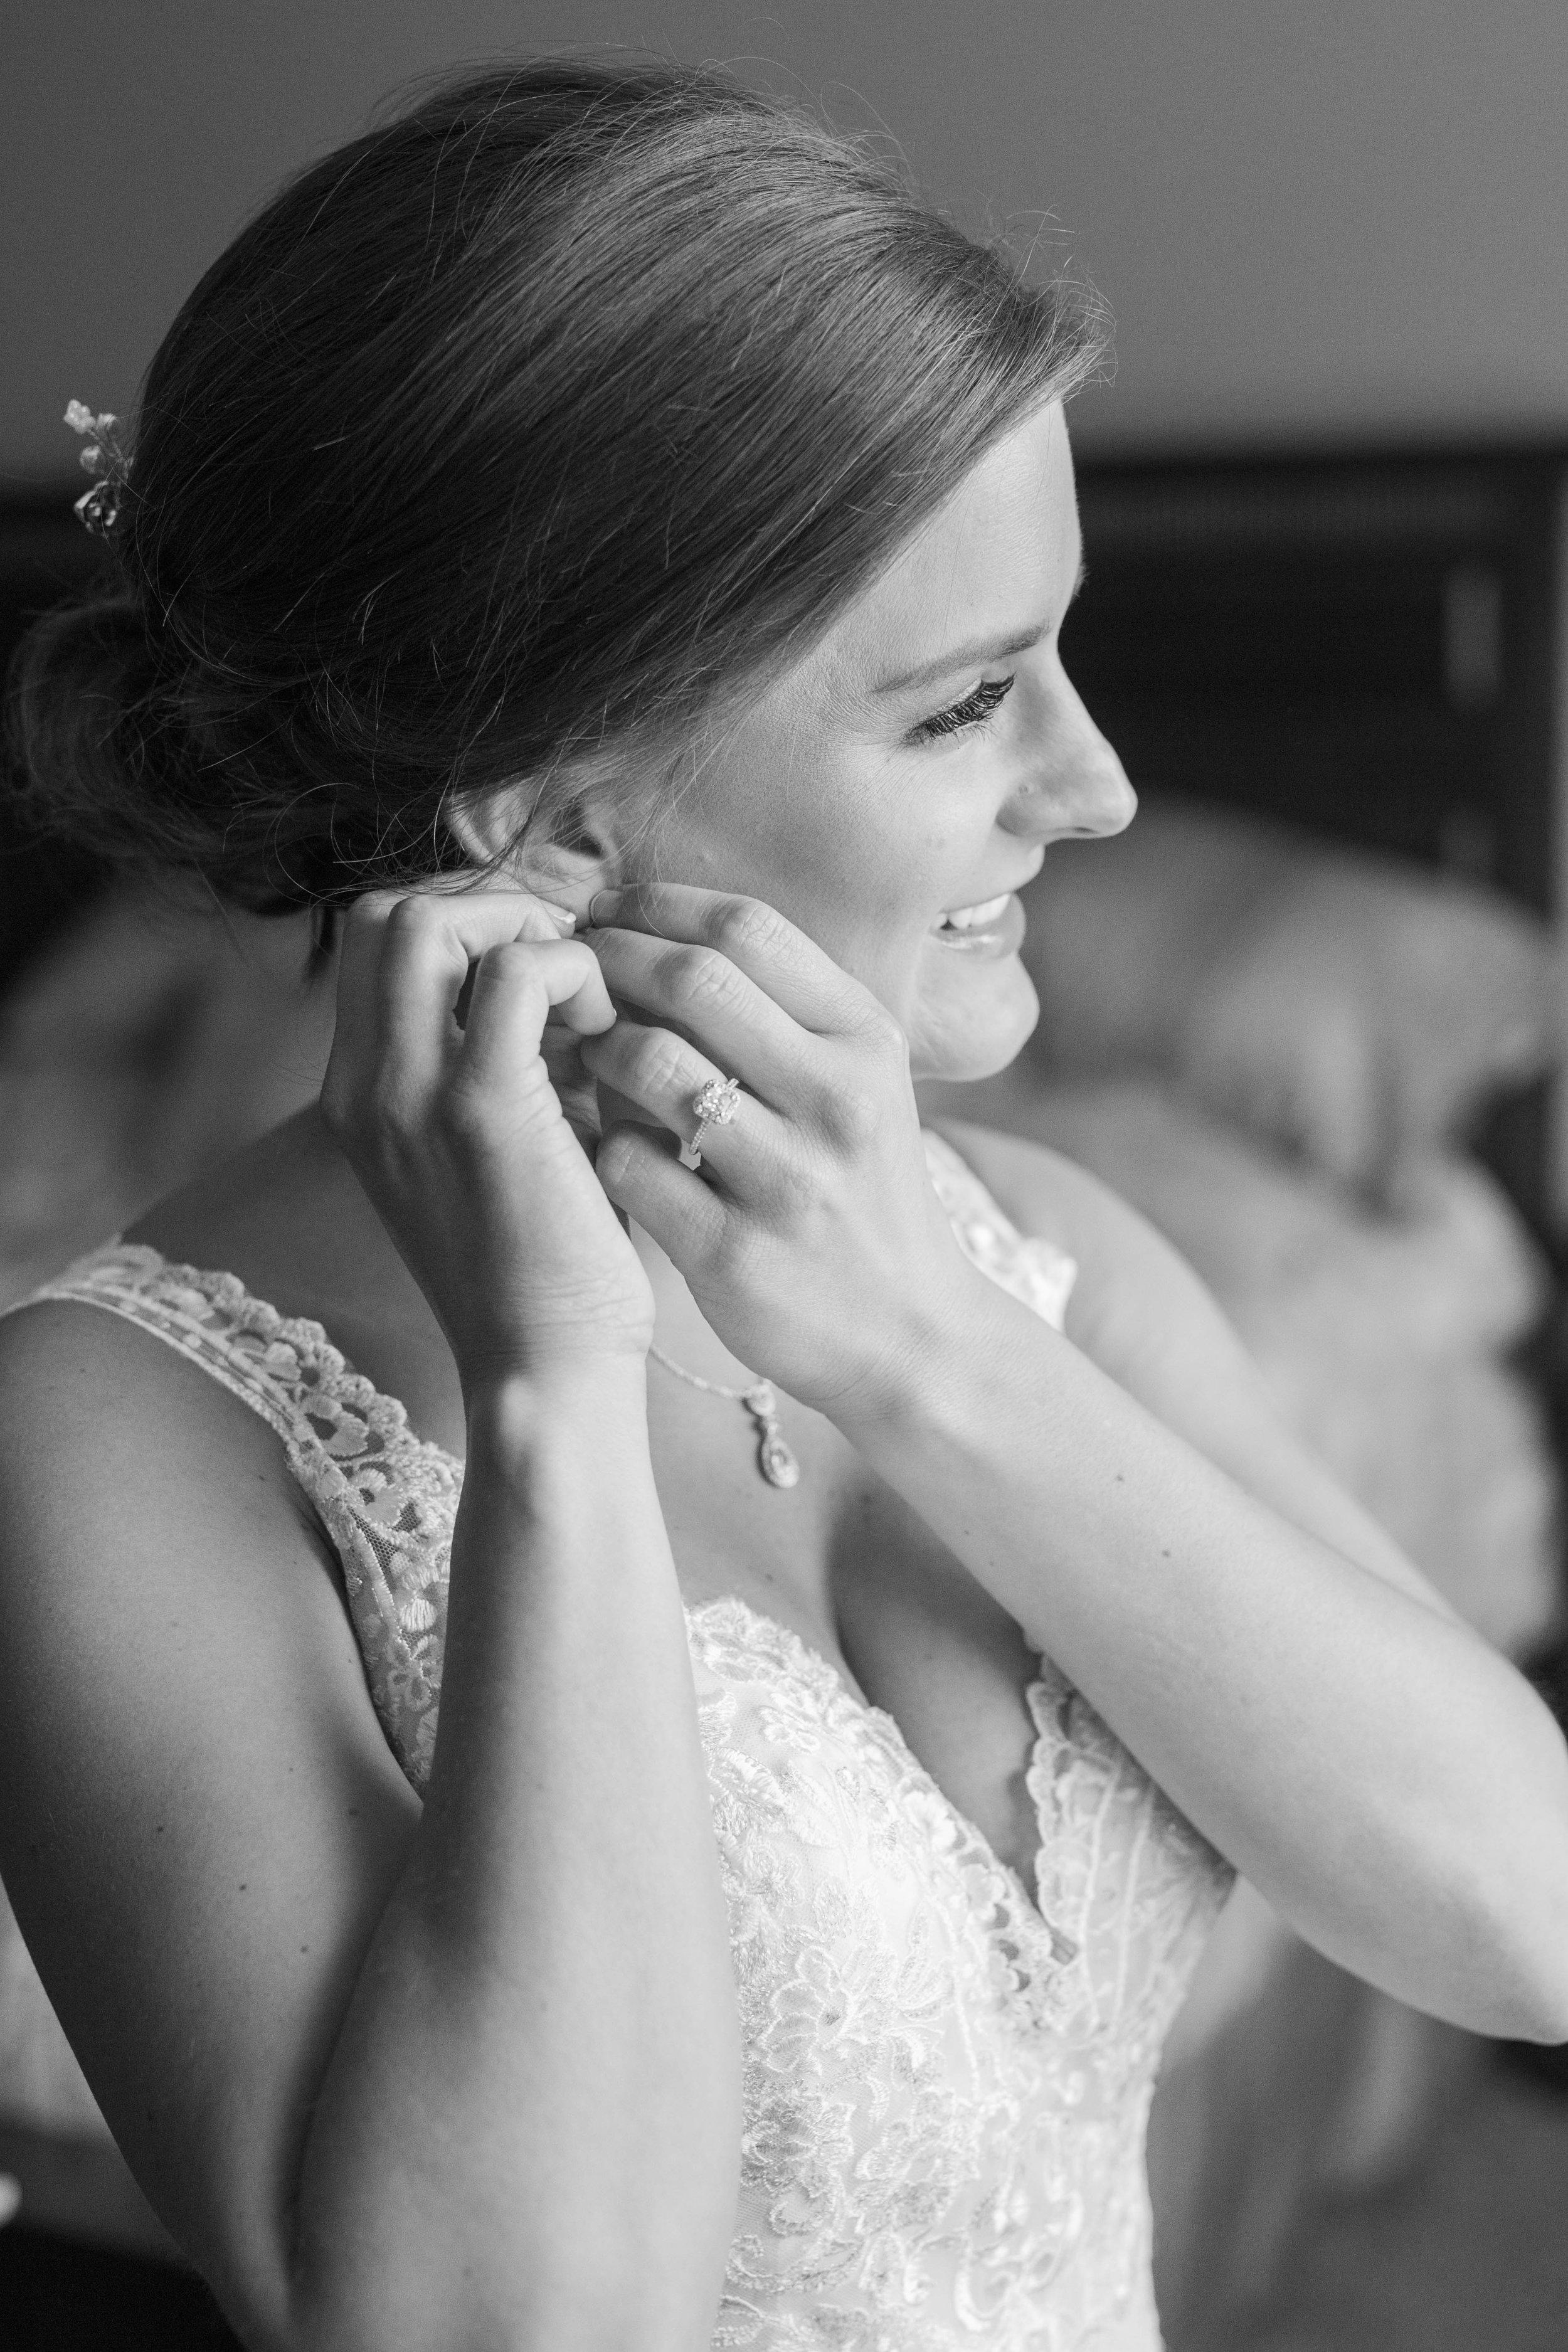 shotbychelsea_wedding_blog-4.jpg